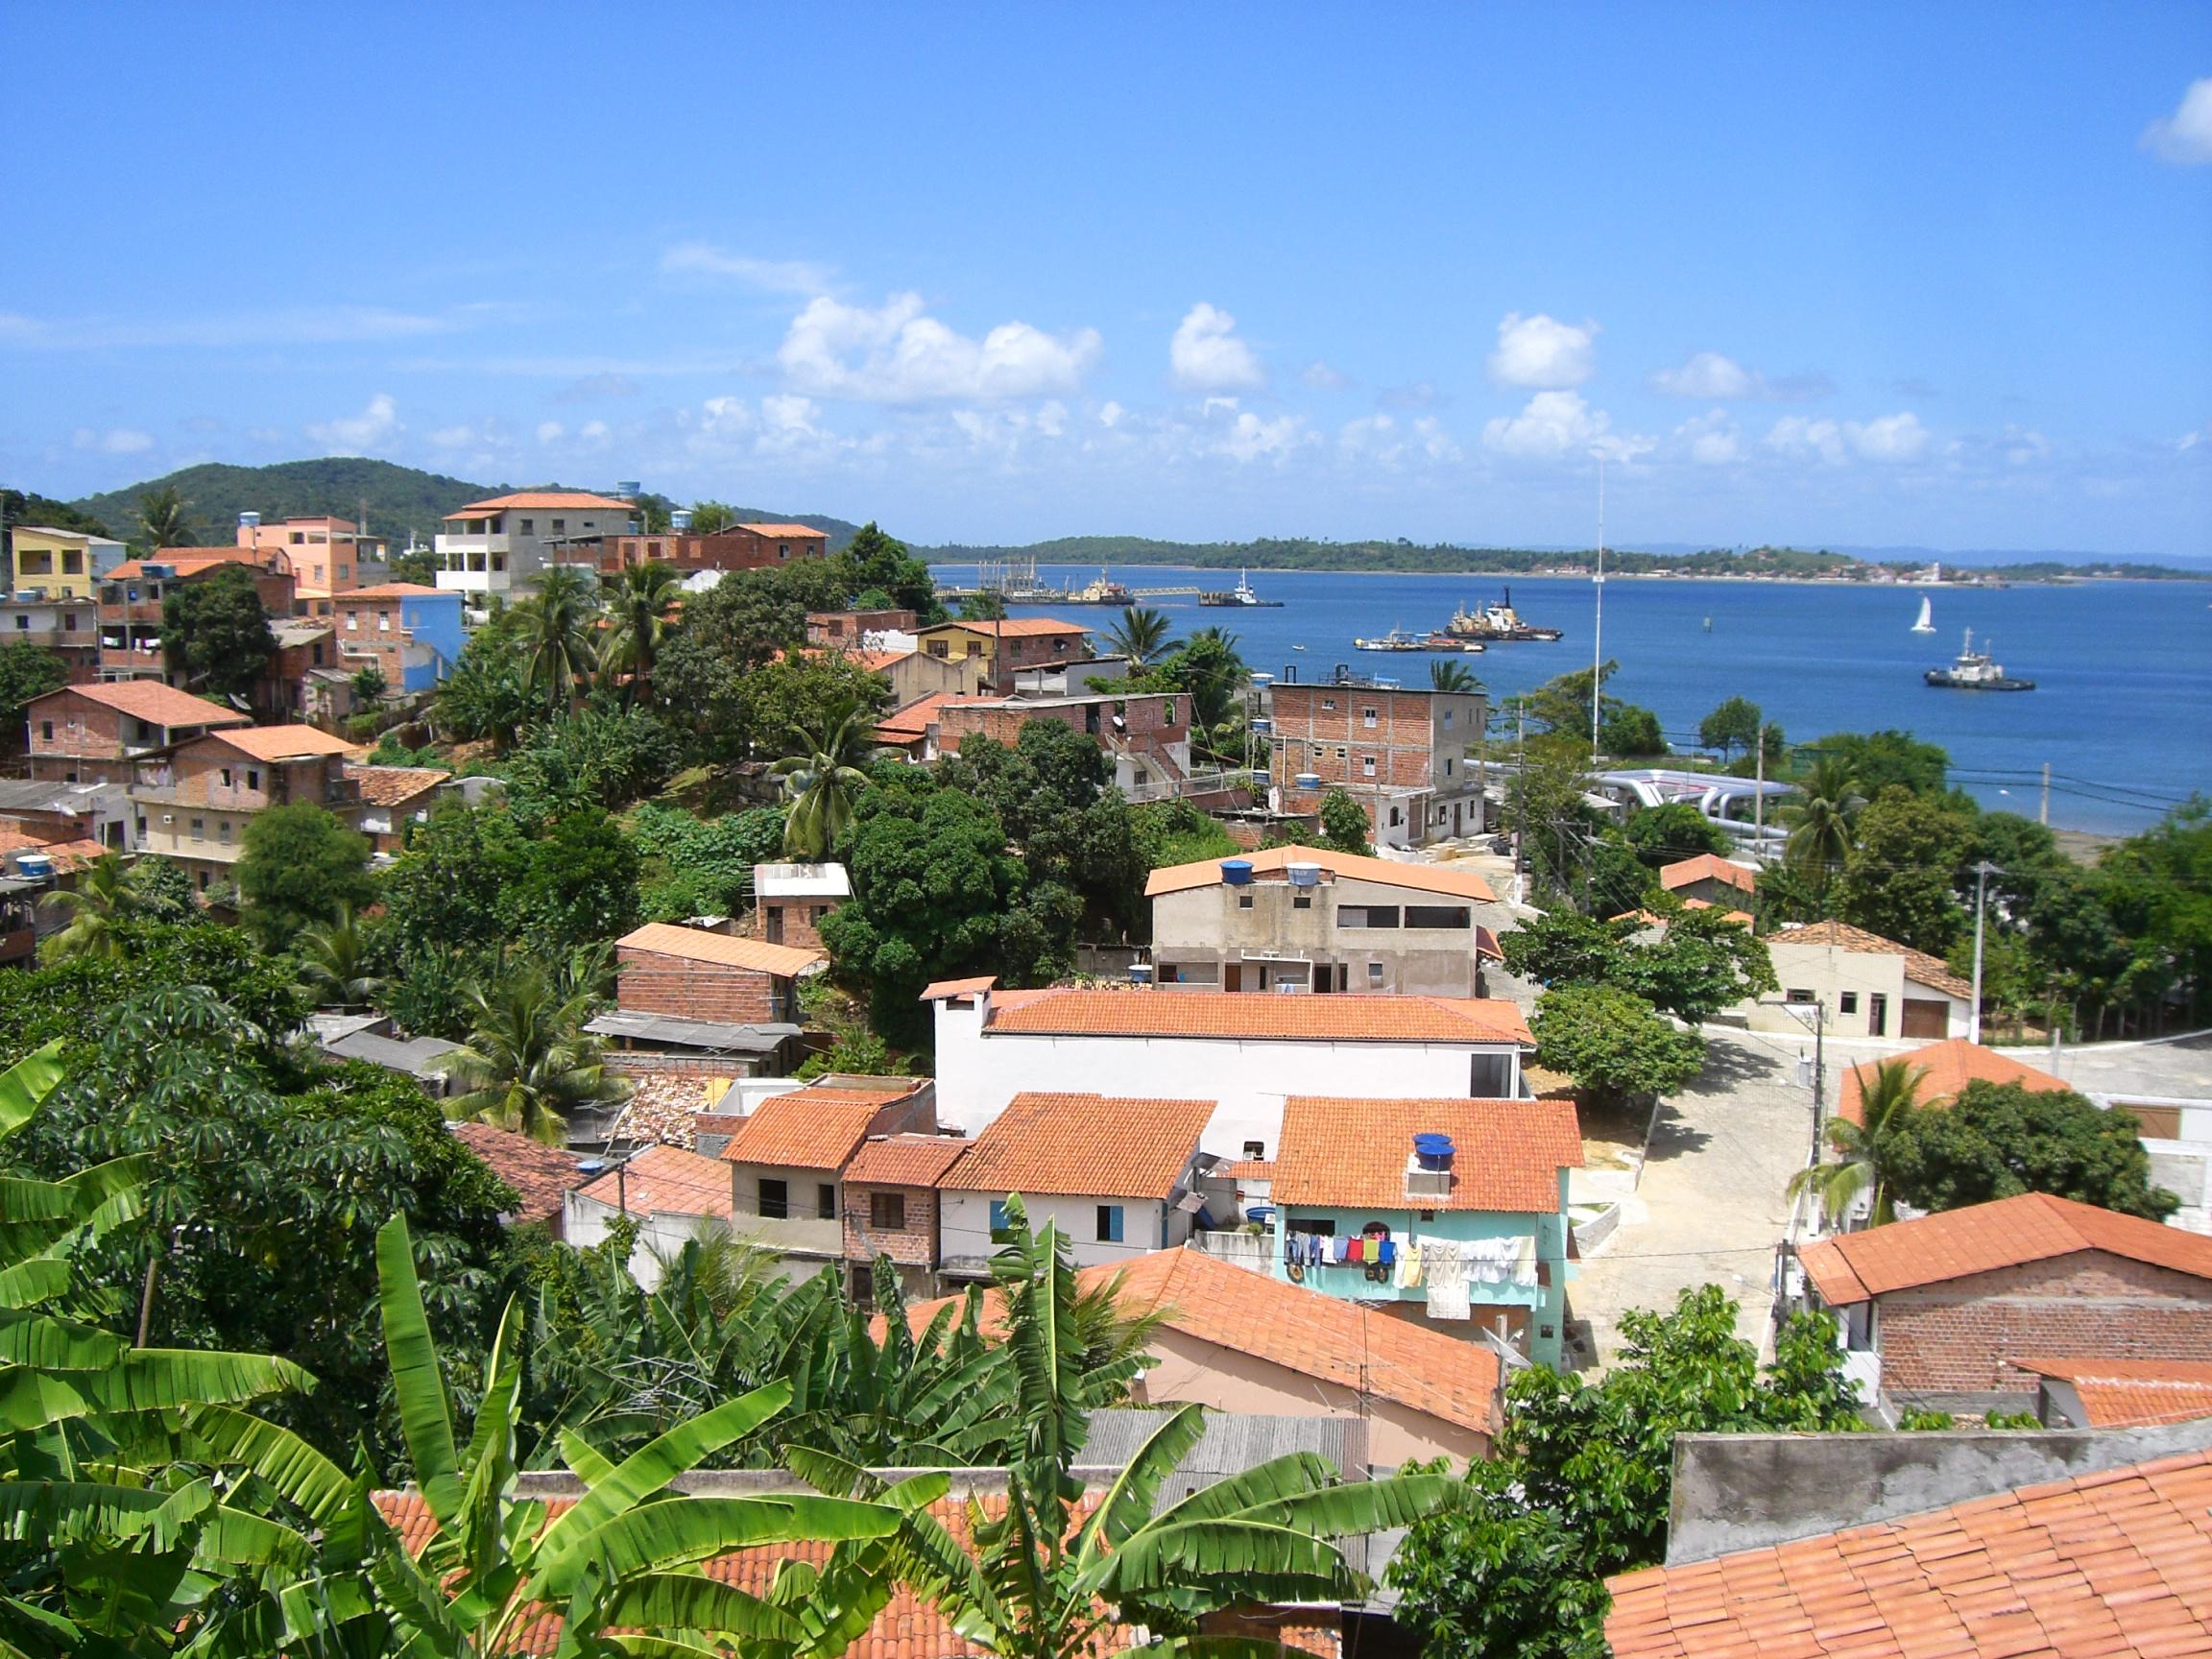 Adustina Bahia fonte: upload.wikimedia.org